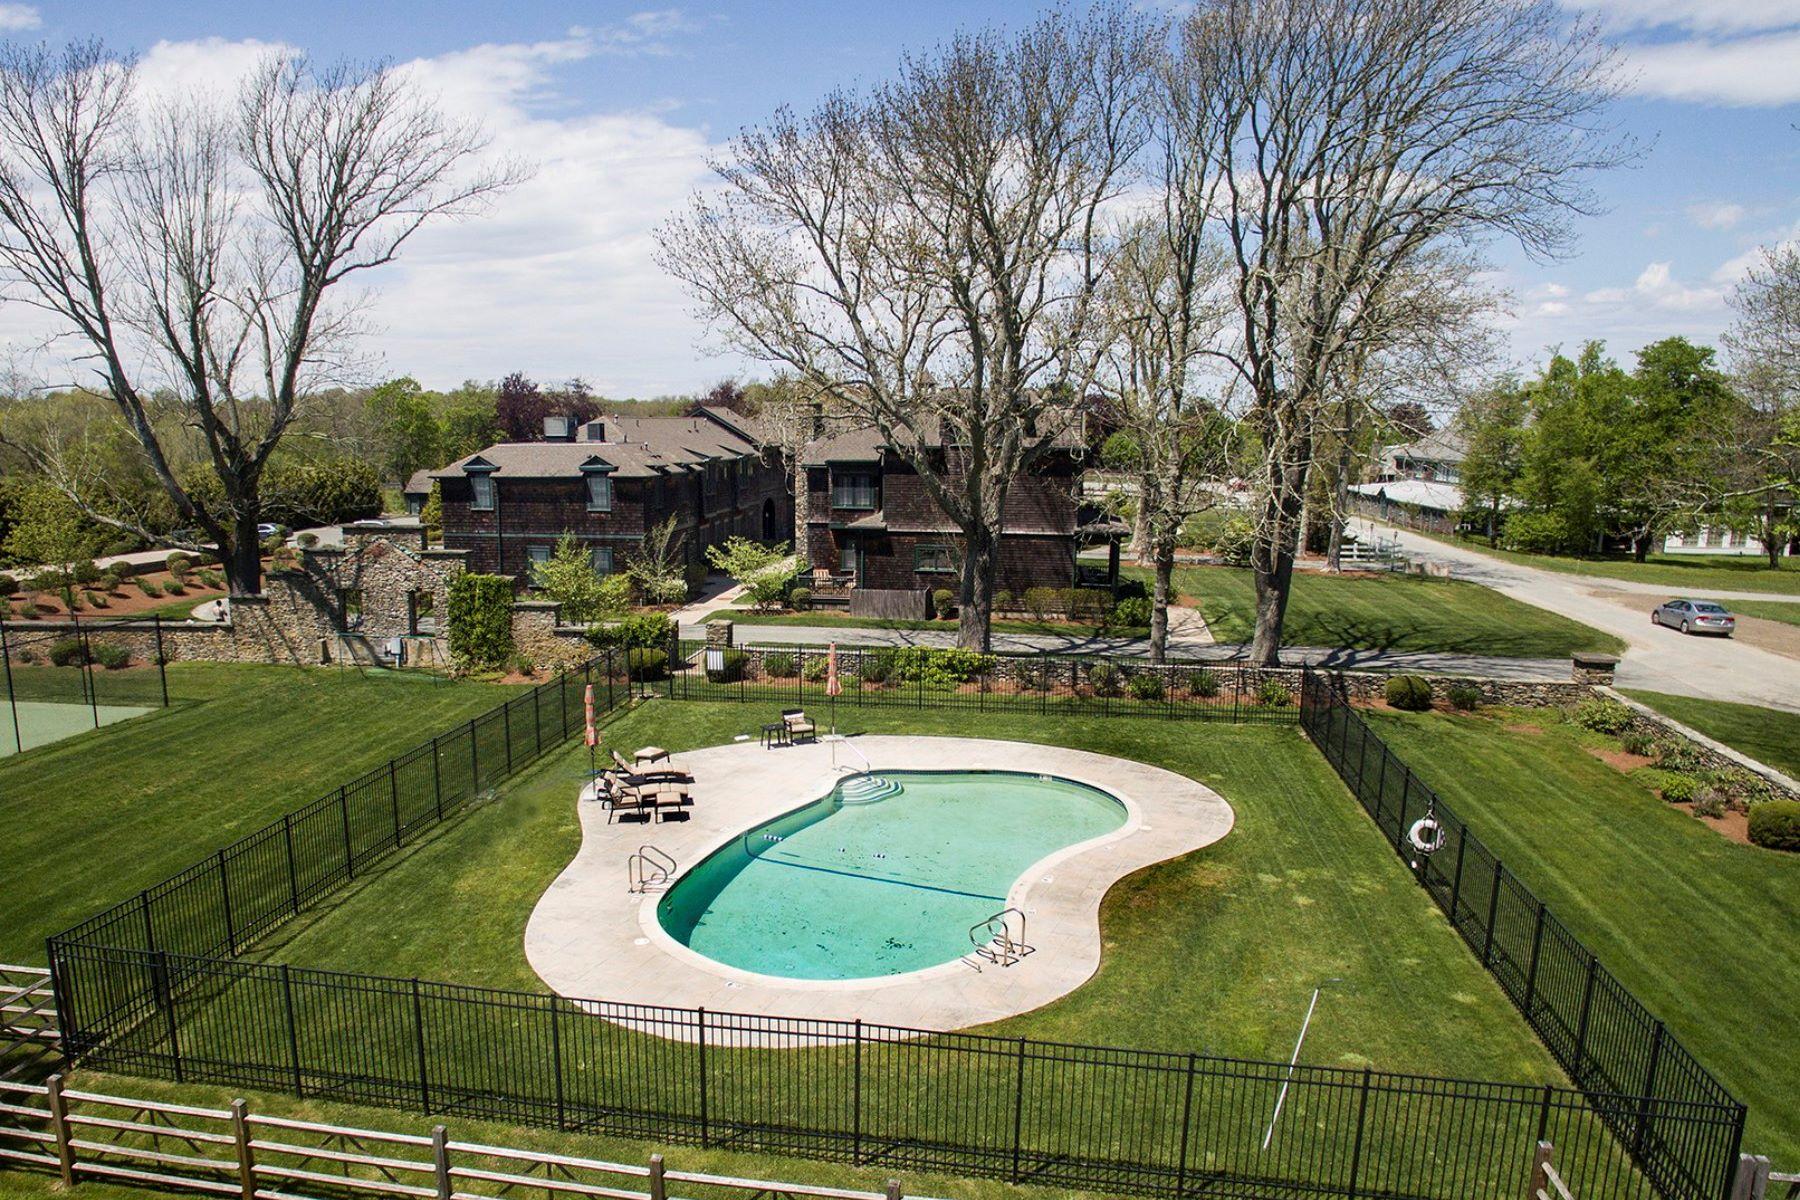 Additional photo for property listing at Vanderbilt Stable Condominiums 53 Sandy Point Farm Road 5 朴茨茅斯, 罗得岛 02871 美国